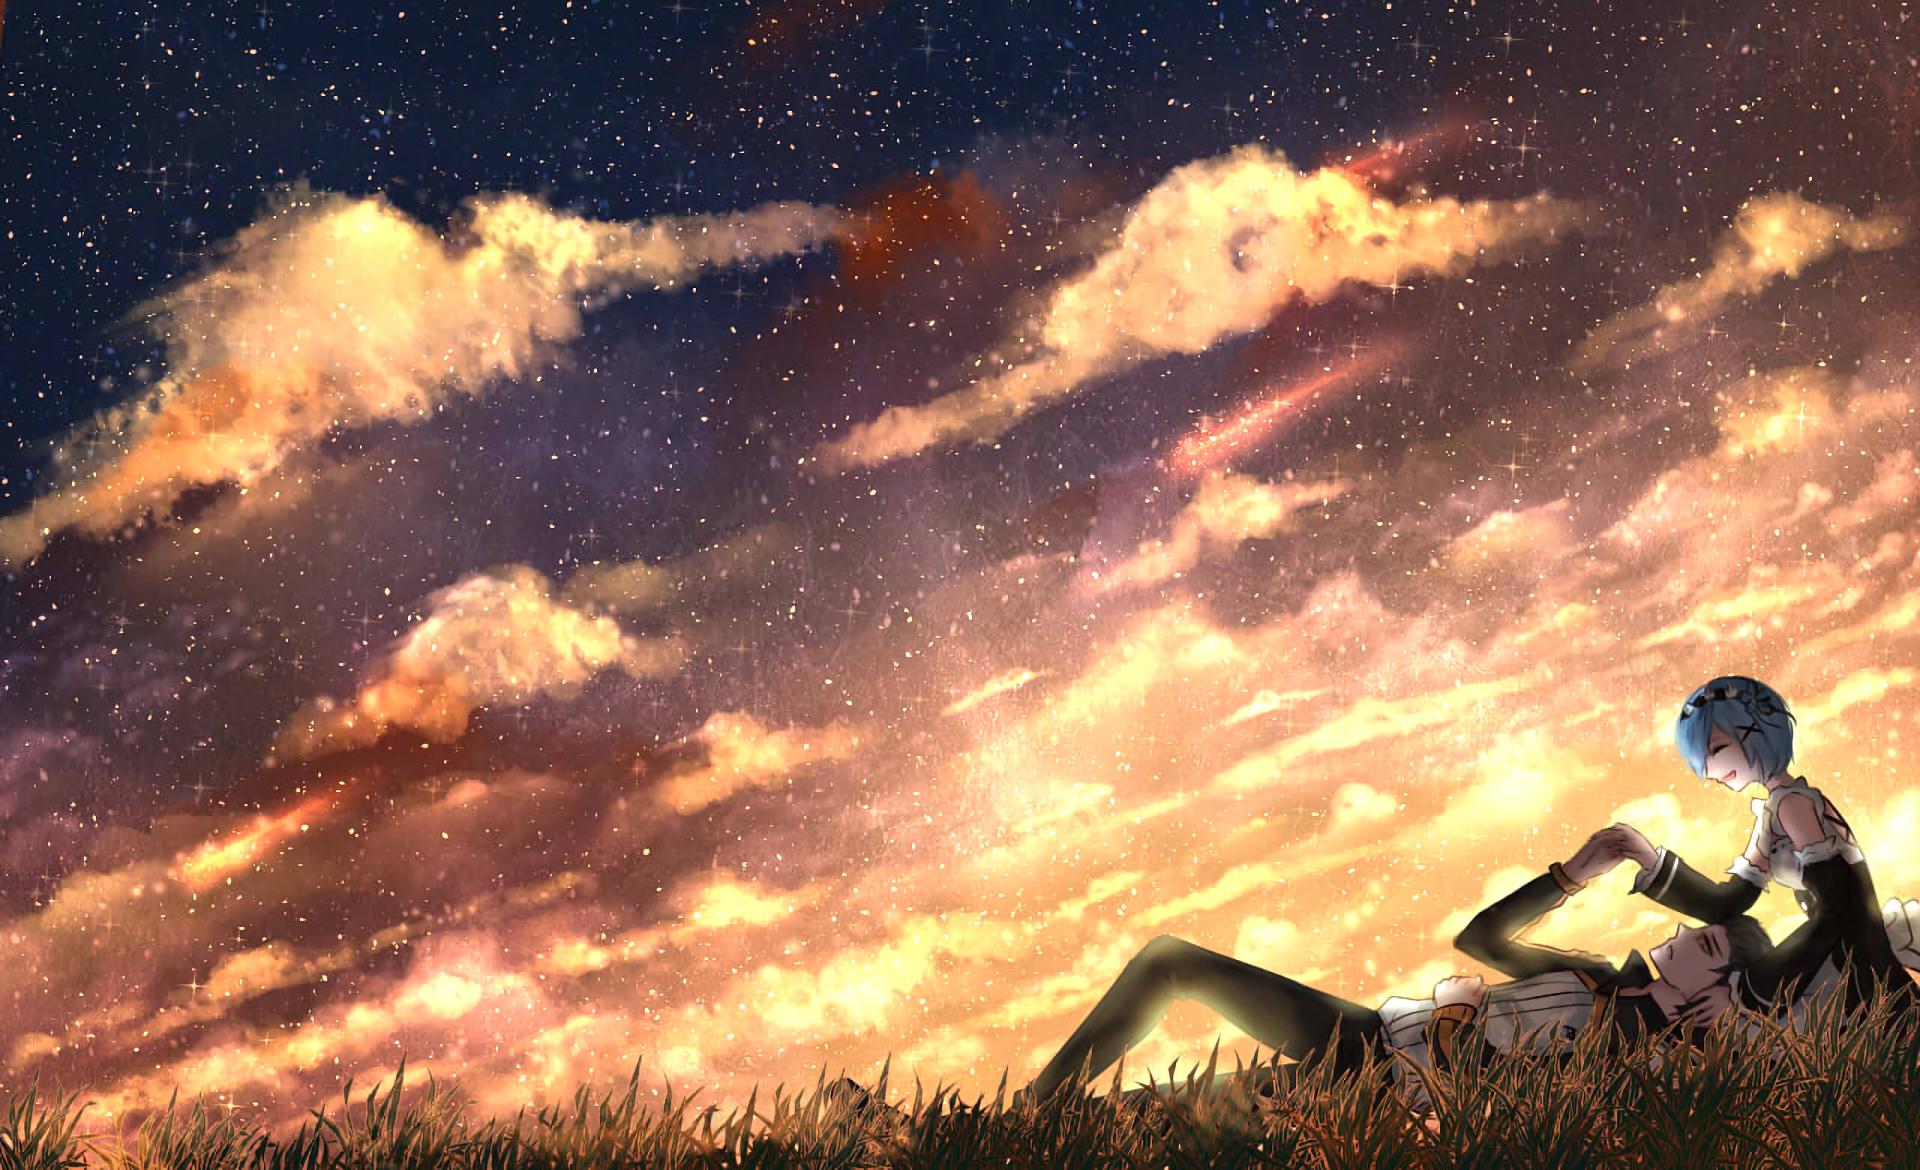 Anime Wallpapers Re:Zero kara Hajimeru Isekai Seikatsu HD 4K Download For Mobile iPhone & PC